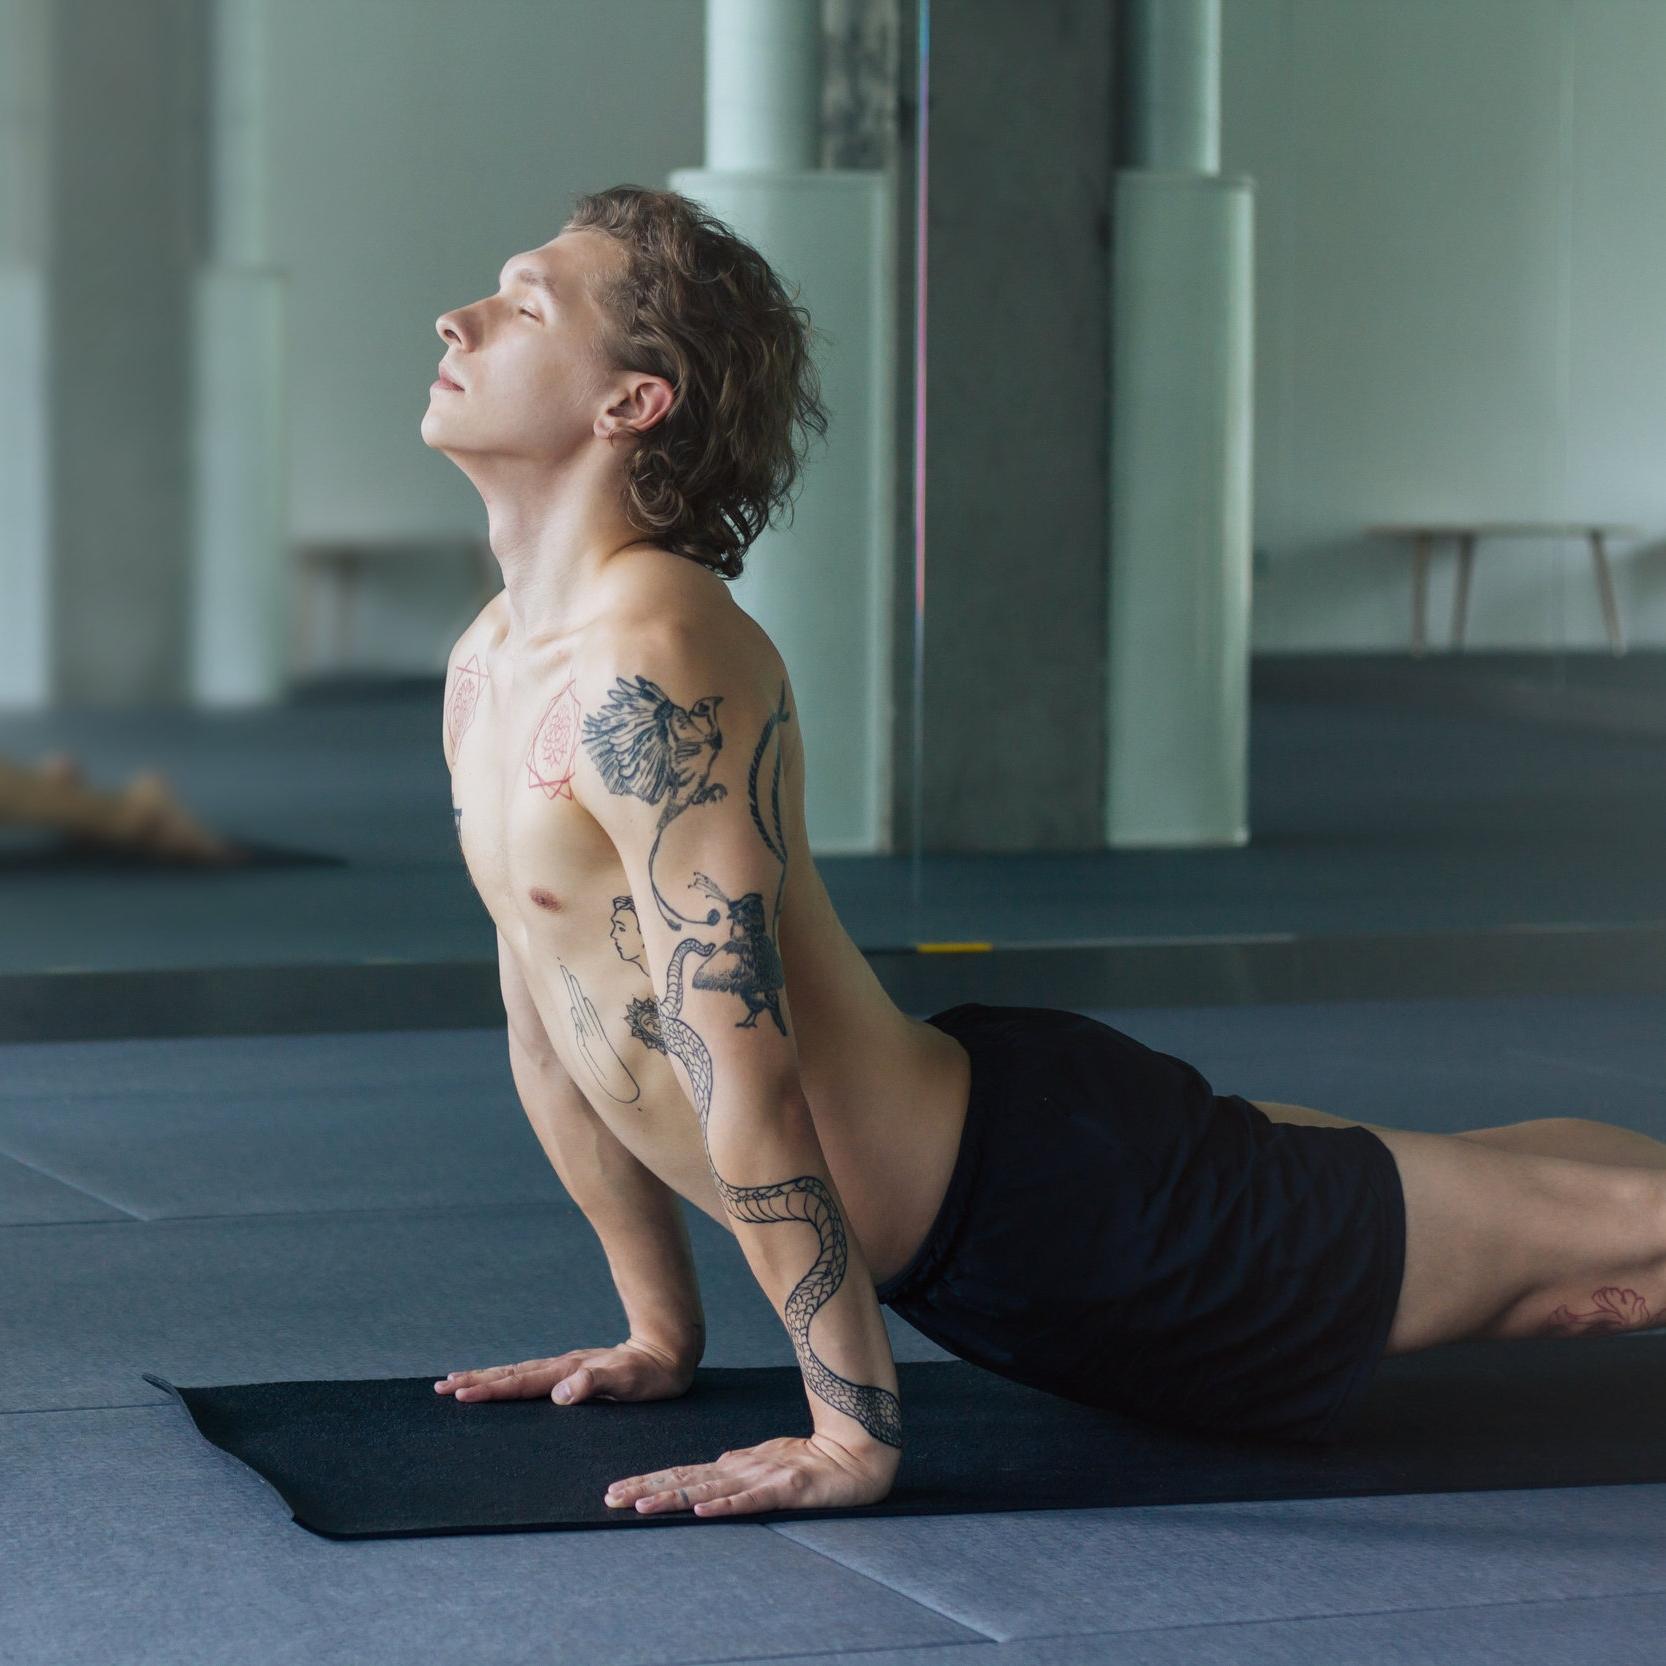 tattooed guy practices yoga